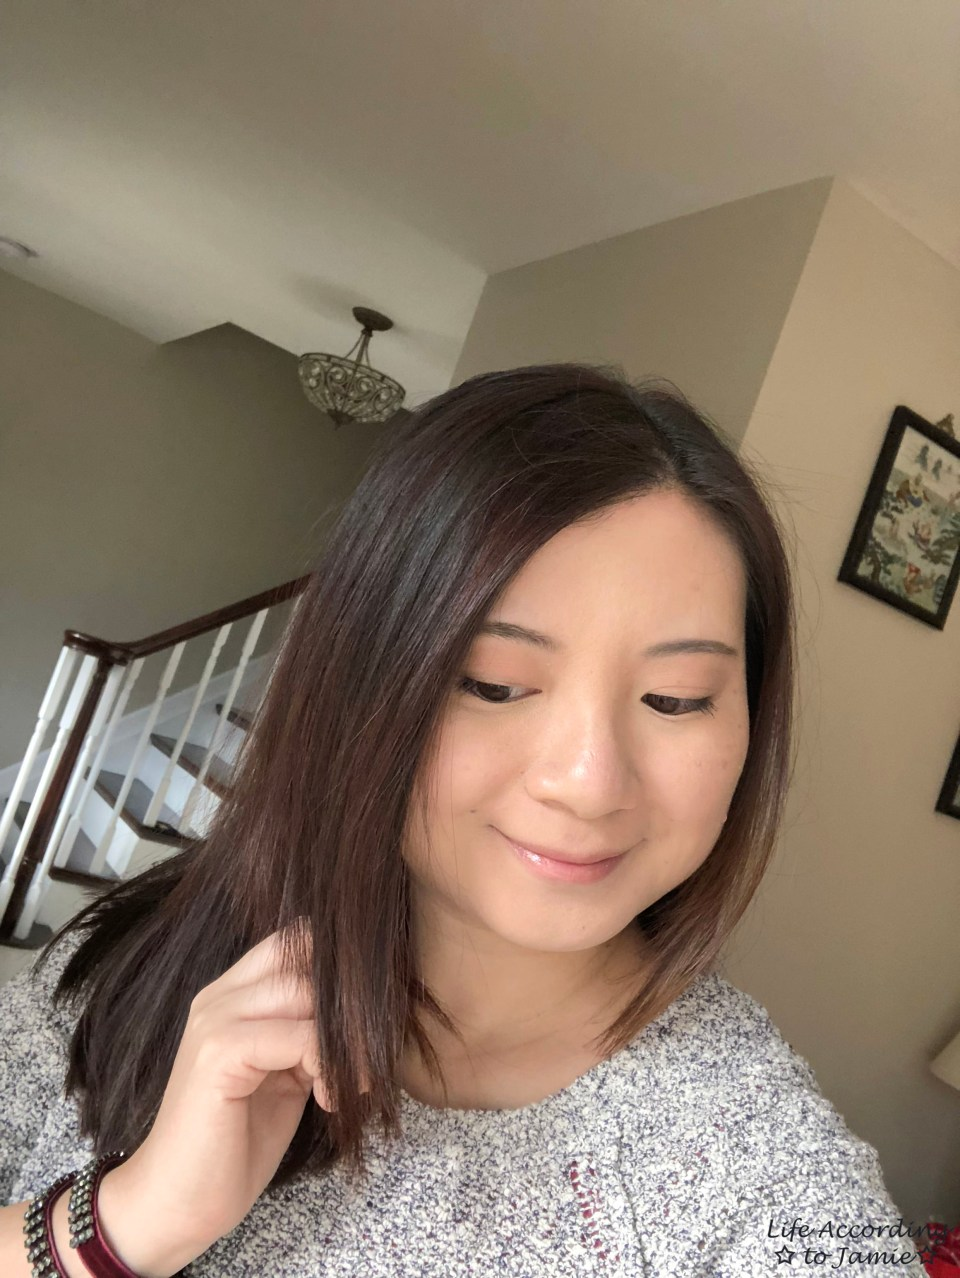 Becca x Chrissy - Glow Face Palette selfie 2